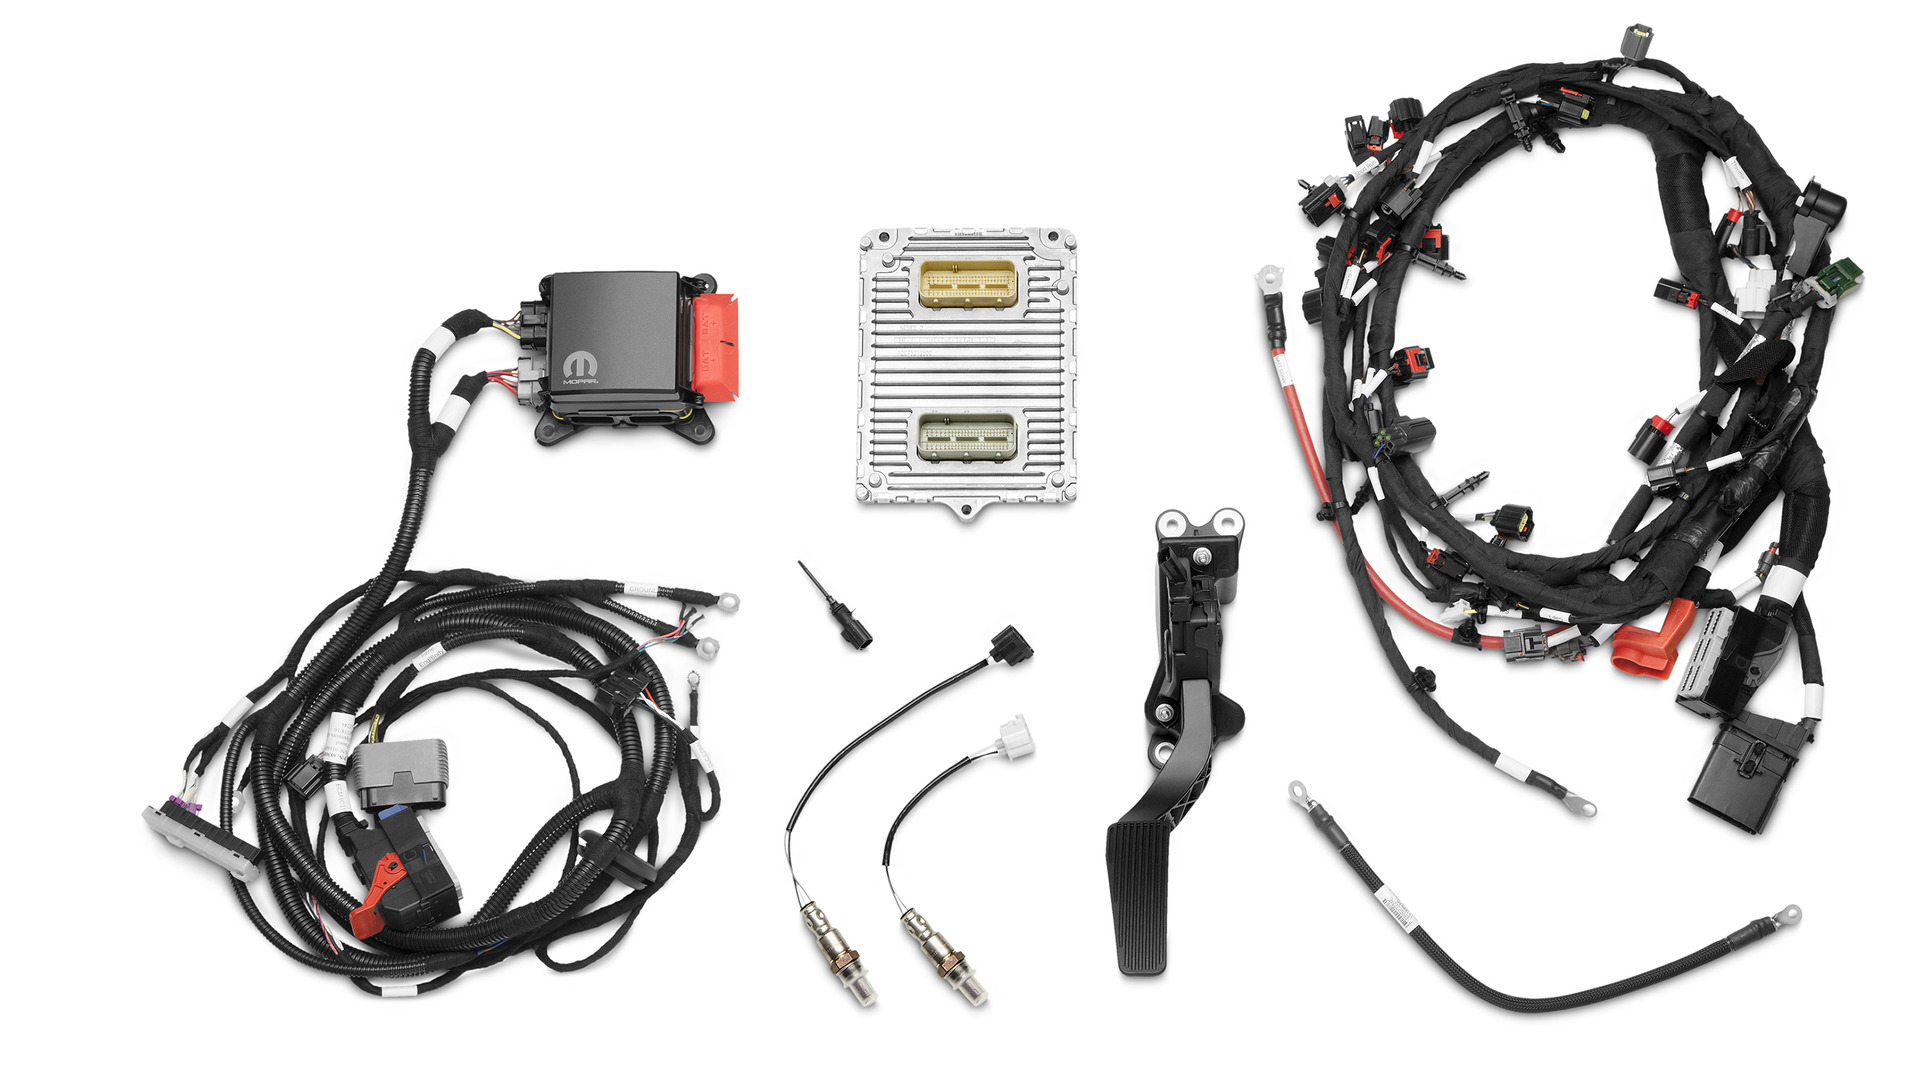 hight resolution of mopar wiring harness kit wiring diagram third level jeep commander starter wiring harness reproduction mopar wiring harnesses